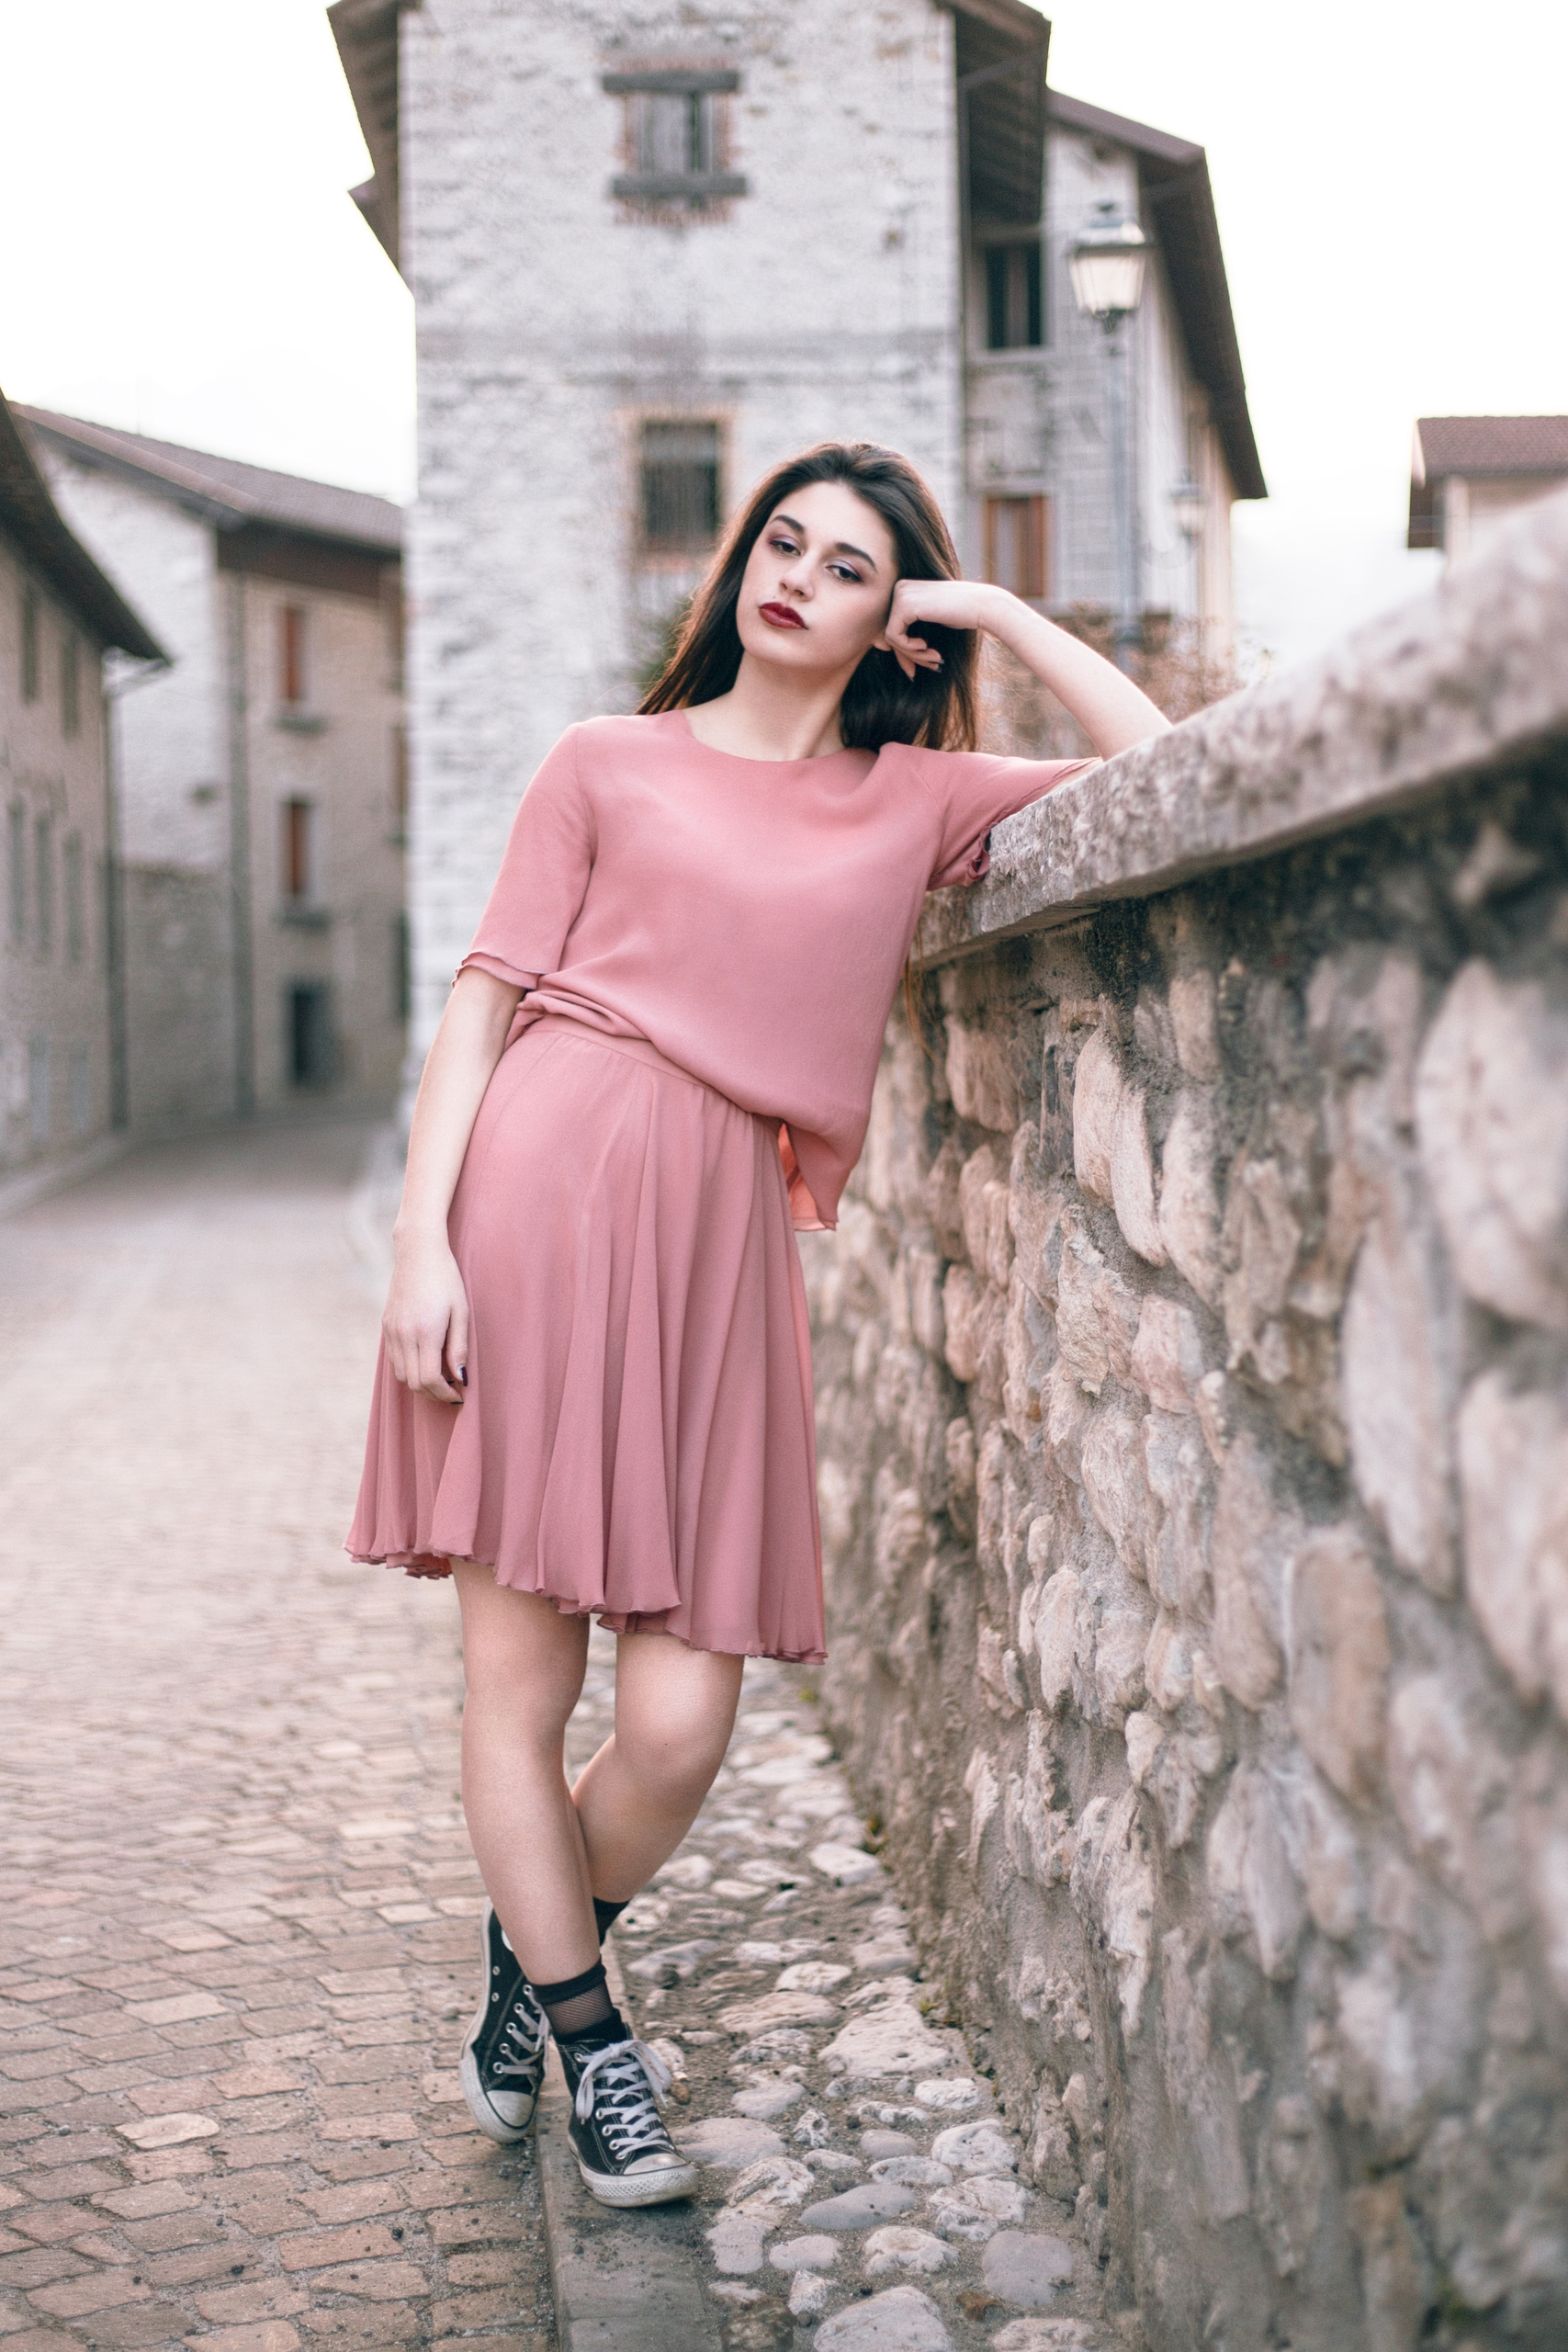 Barcis (PN - Italy) Laura - photography - giovix | ello